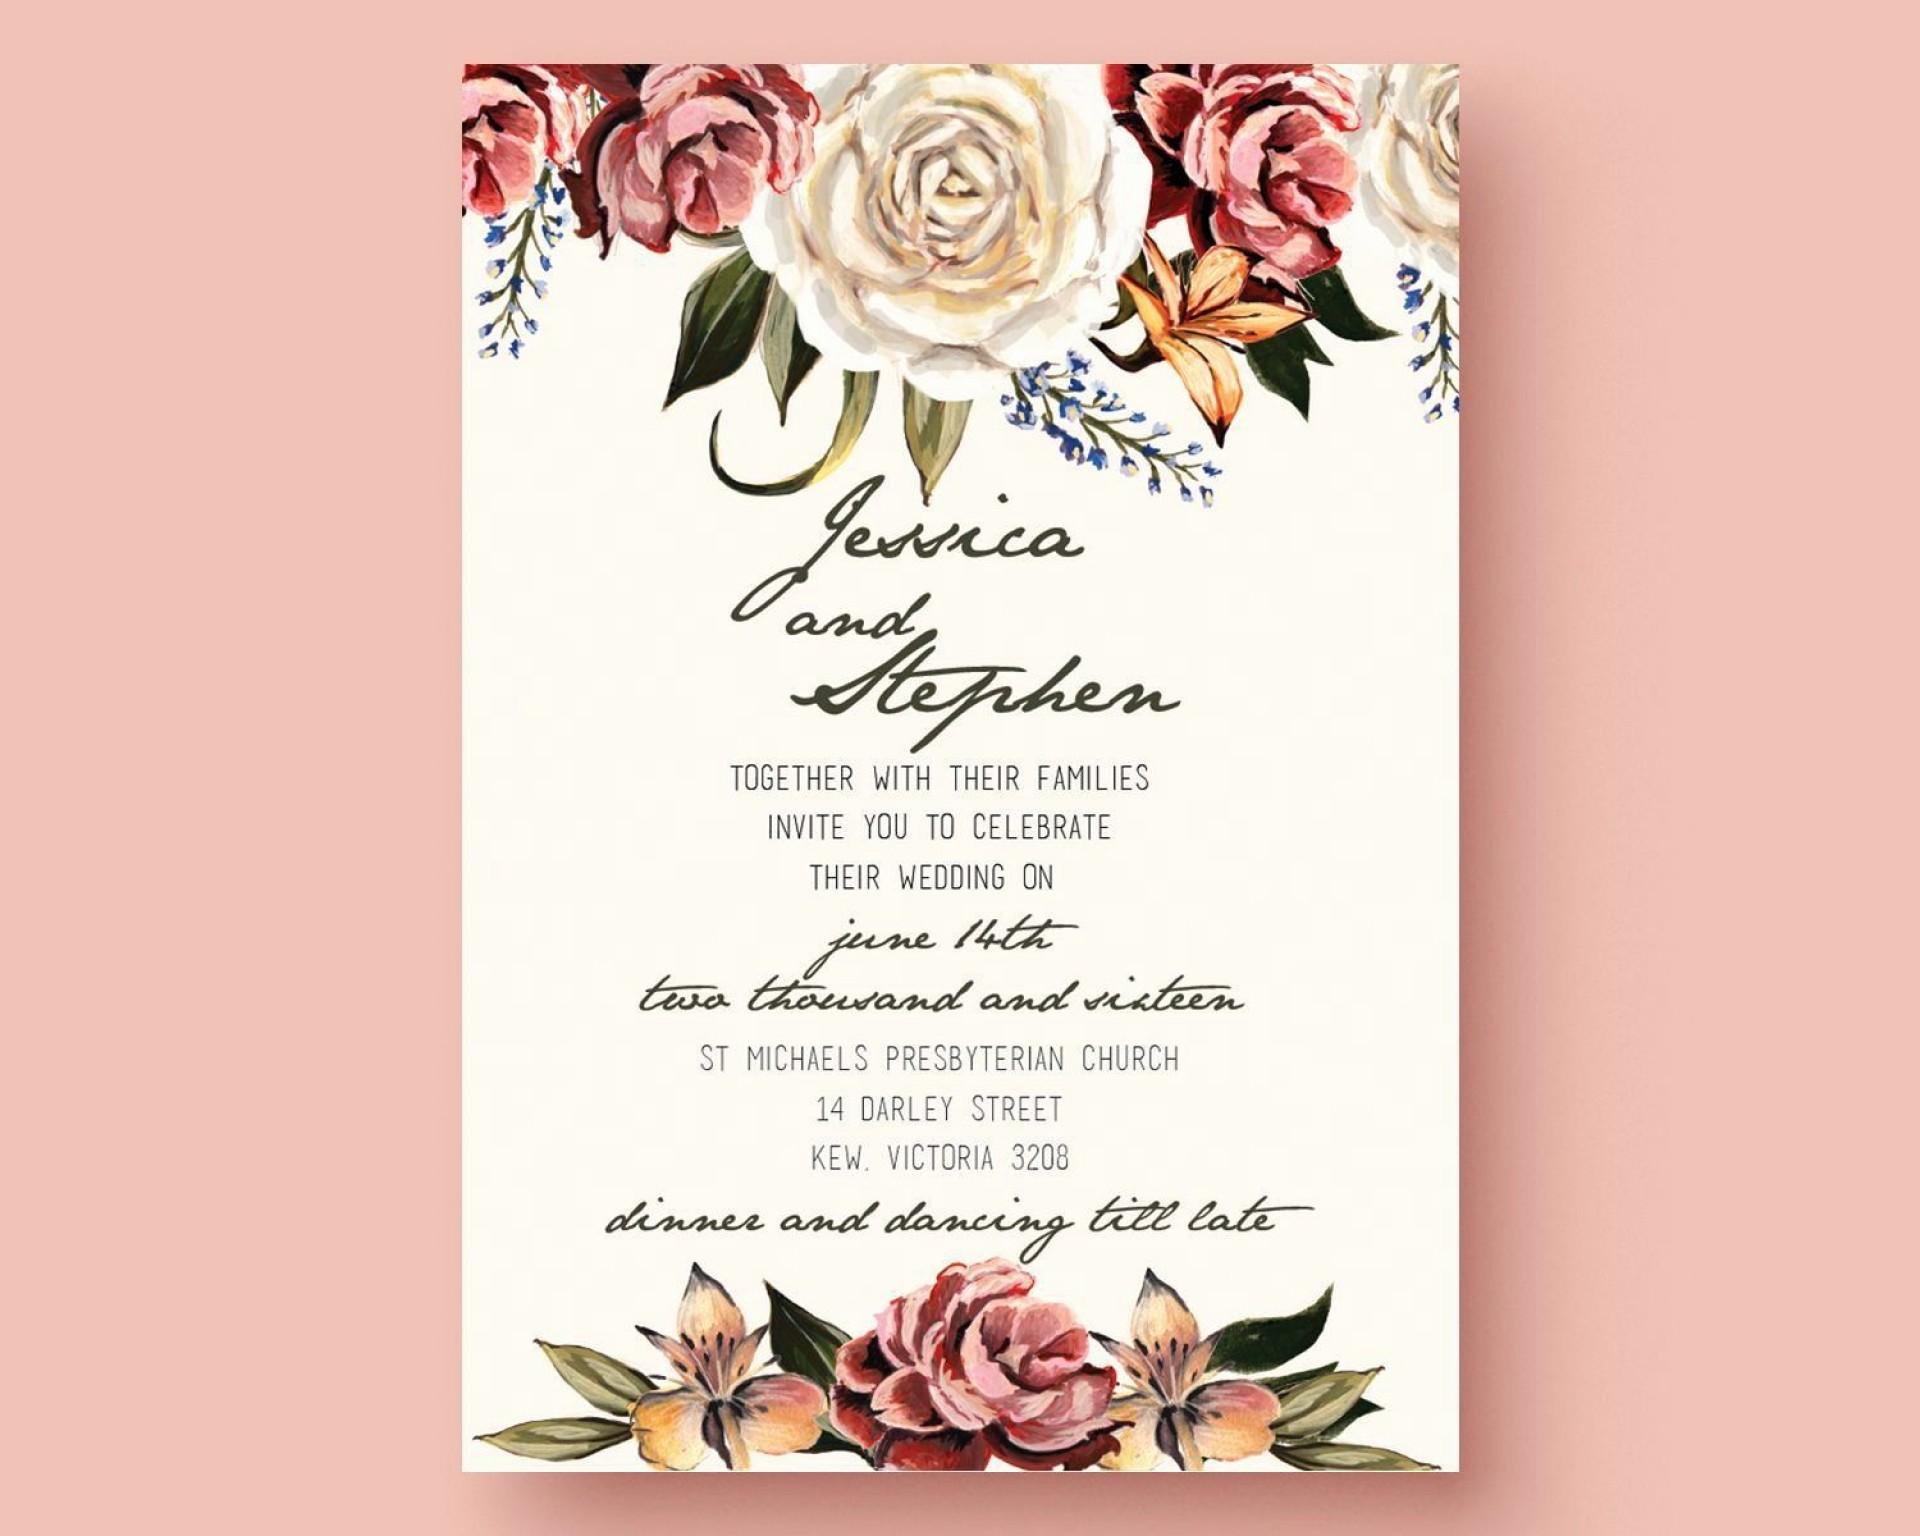 002 Incredible Sample Wedding Invitation Maker 1920